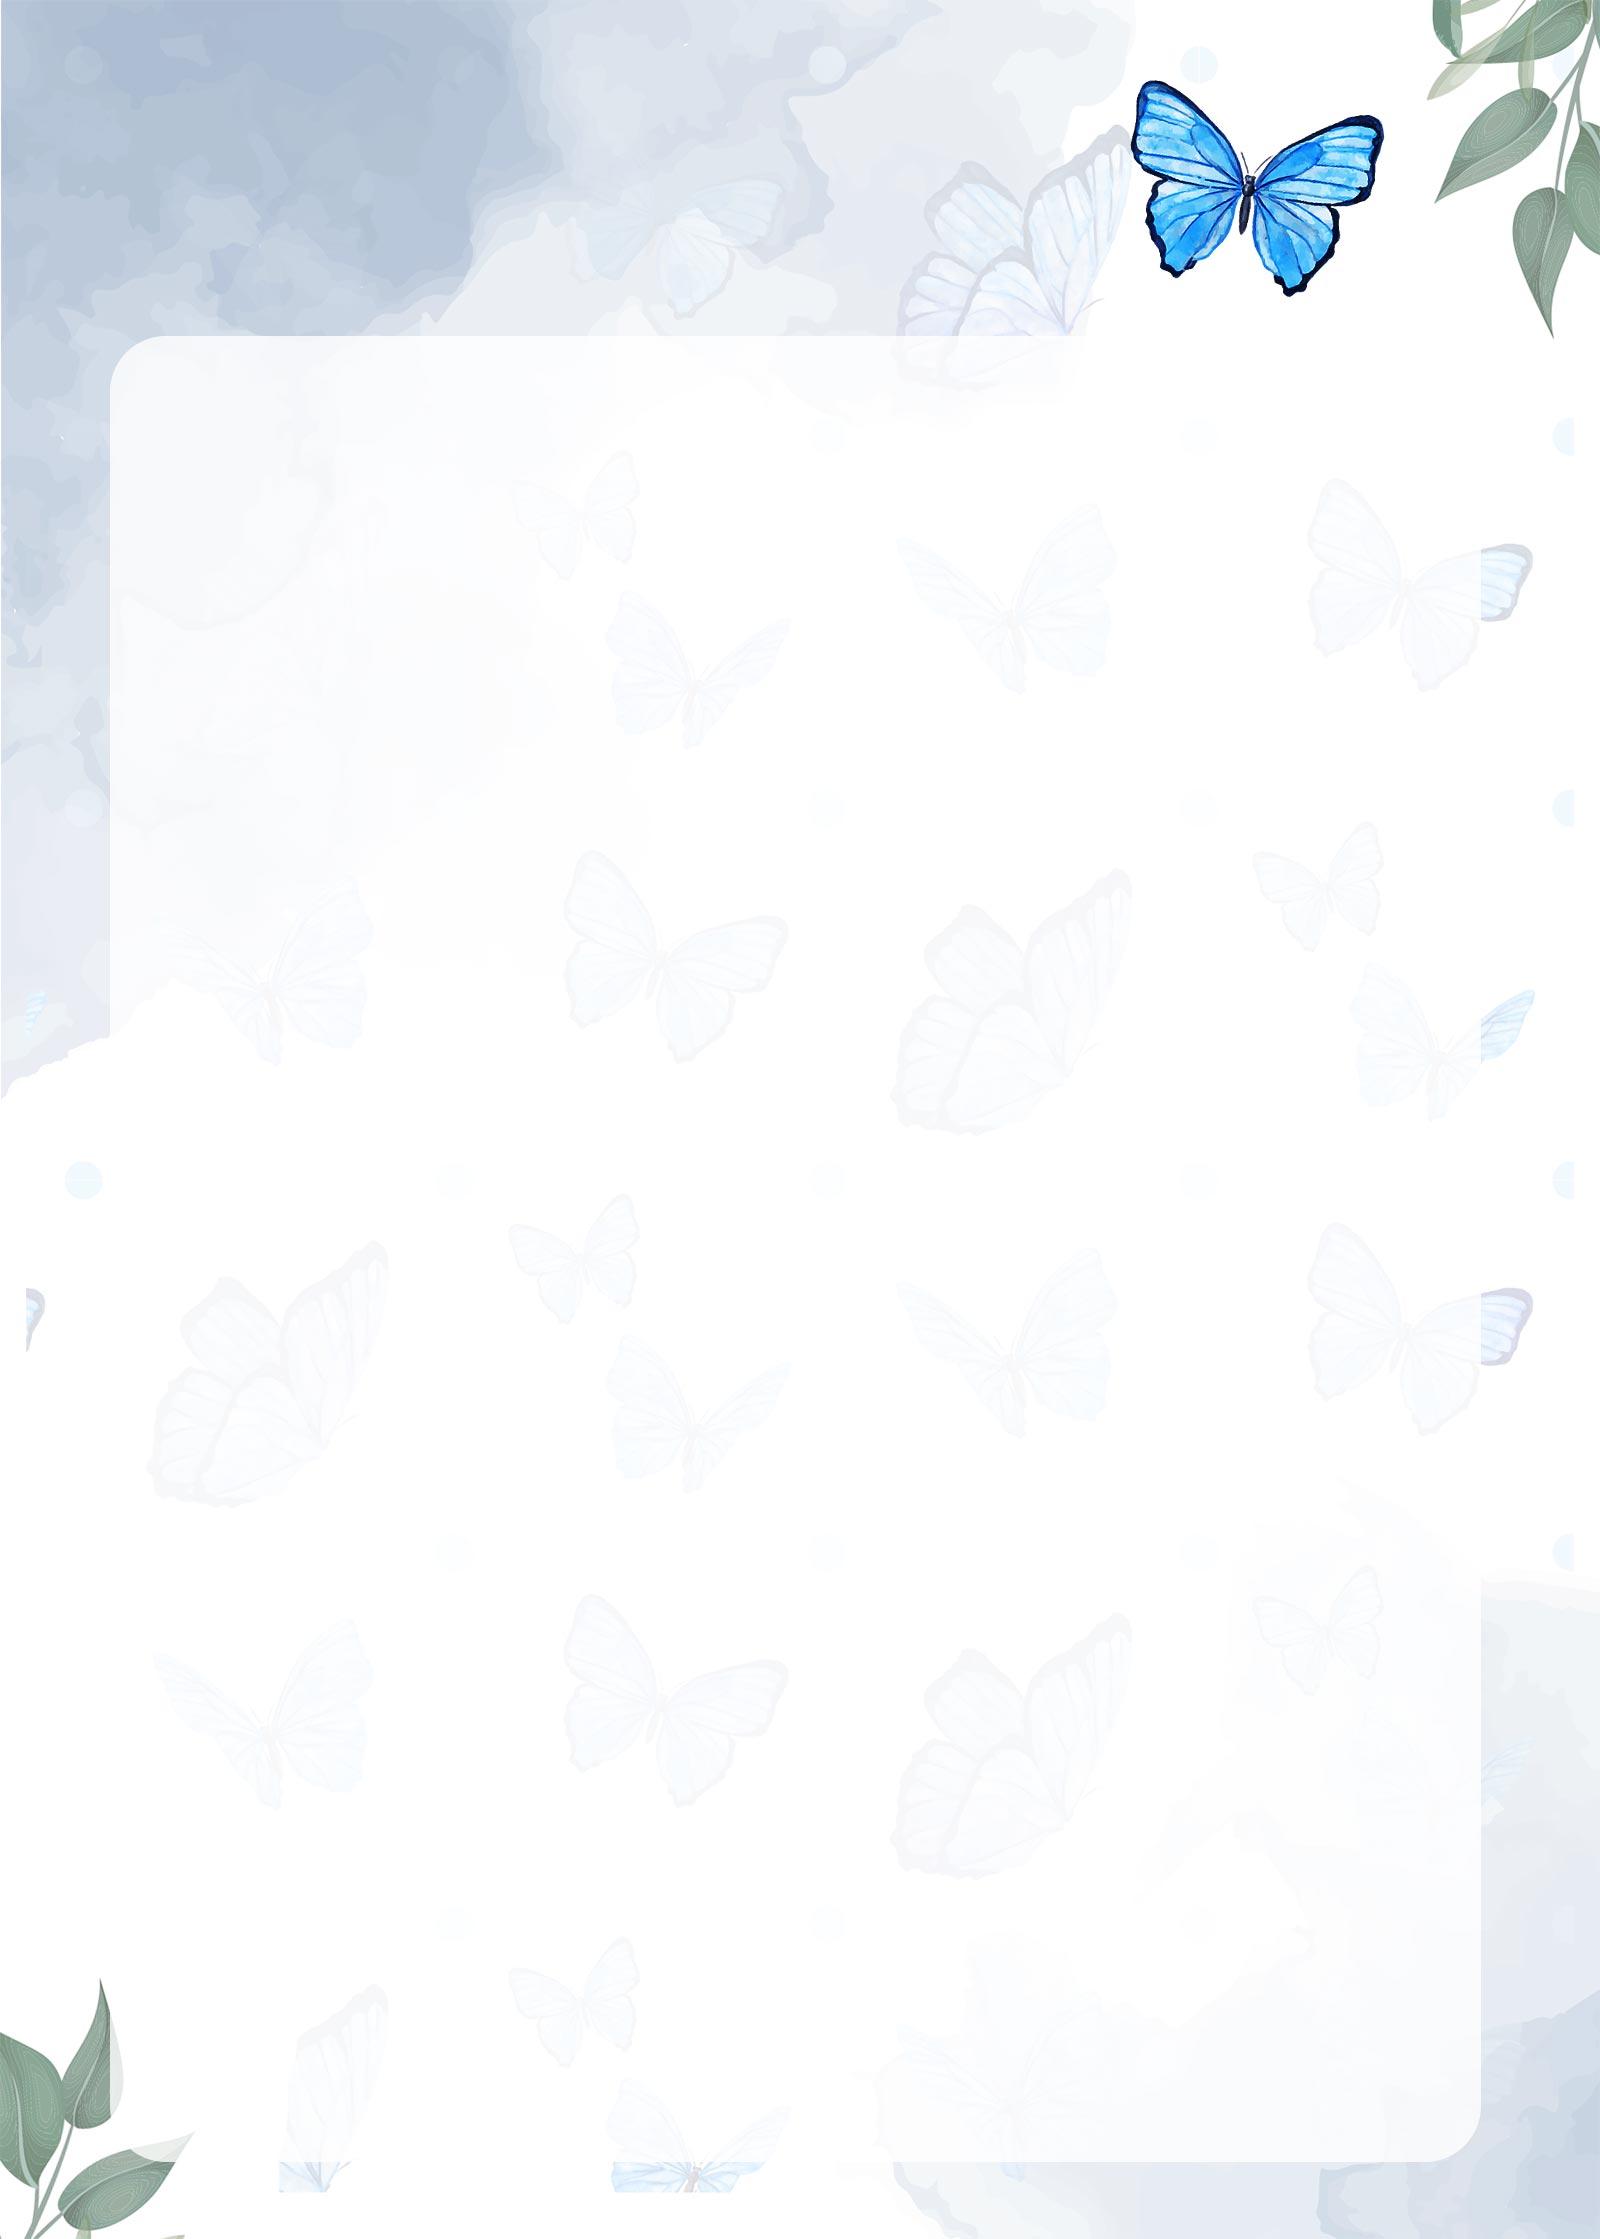 Planner Borboletas Azuis Molde em Branco